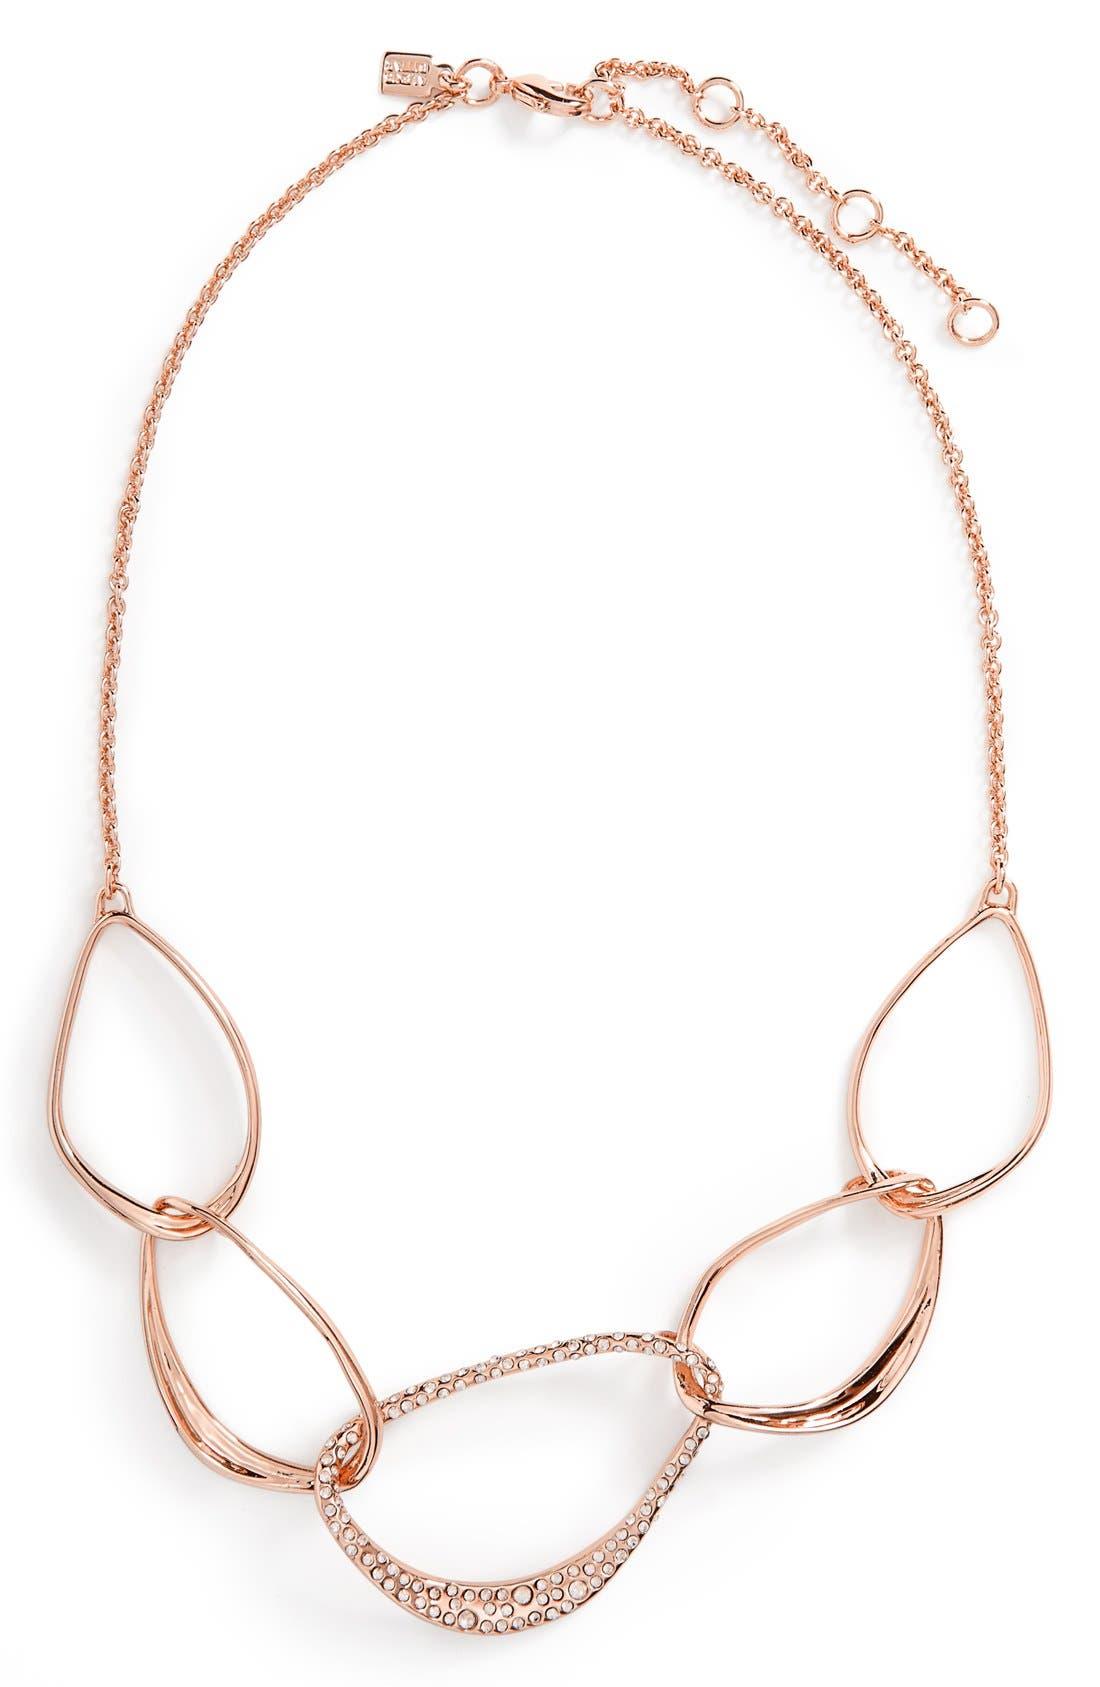 Alternate Image 1 Selected - Alexis Bittar 'Miss Havisham' Link Bib Necklace